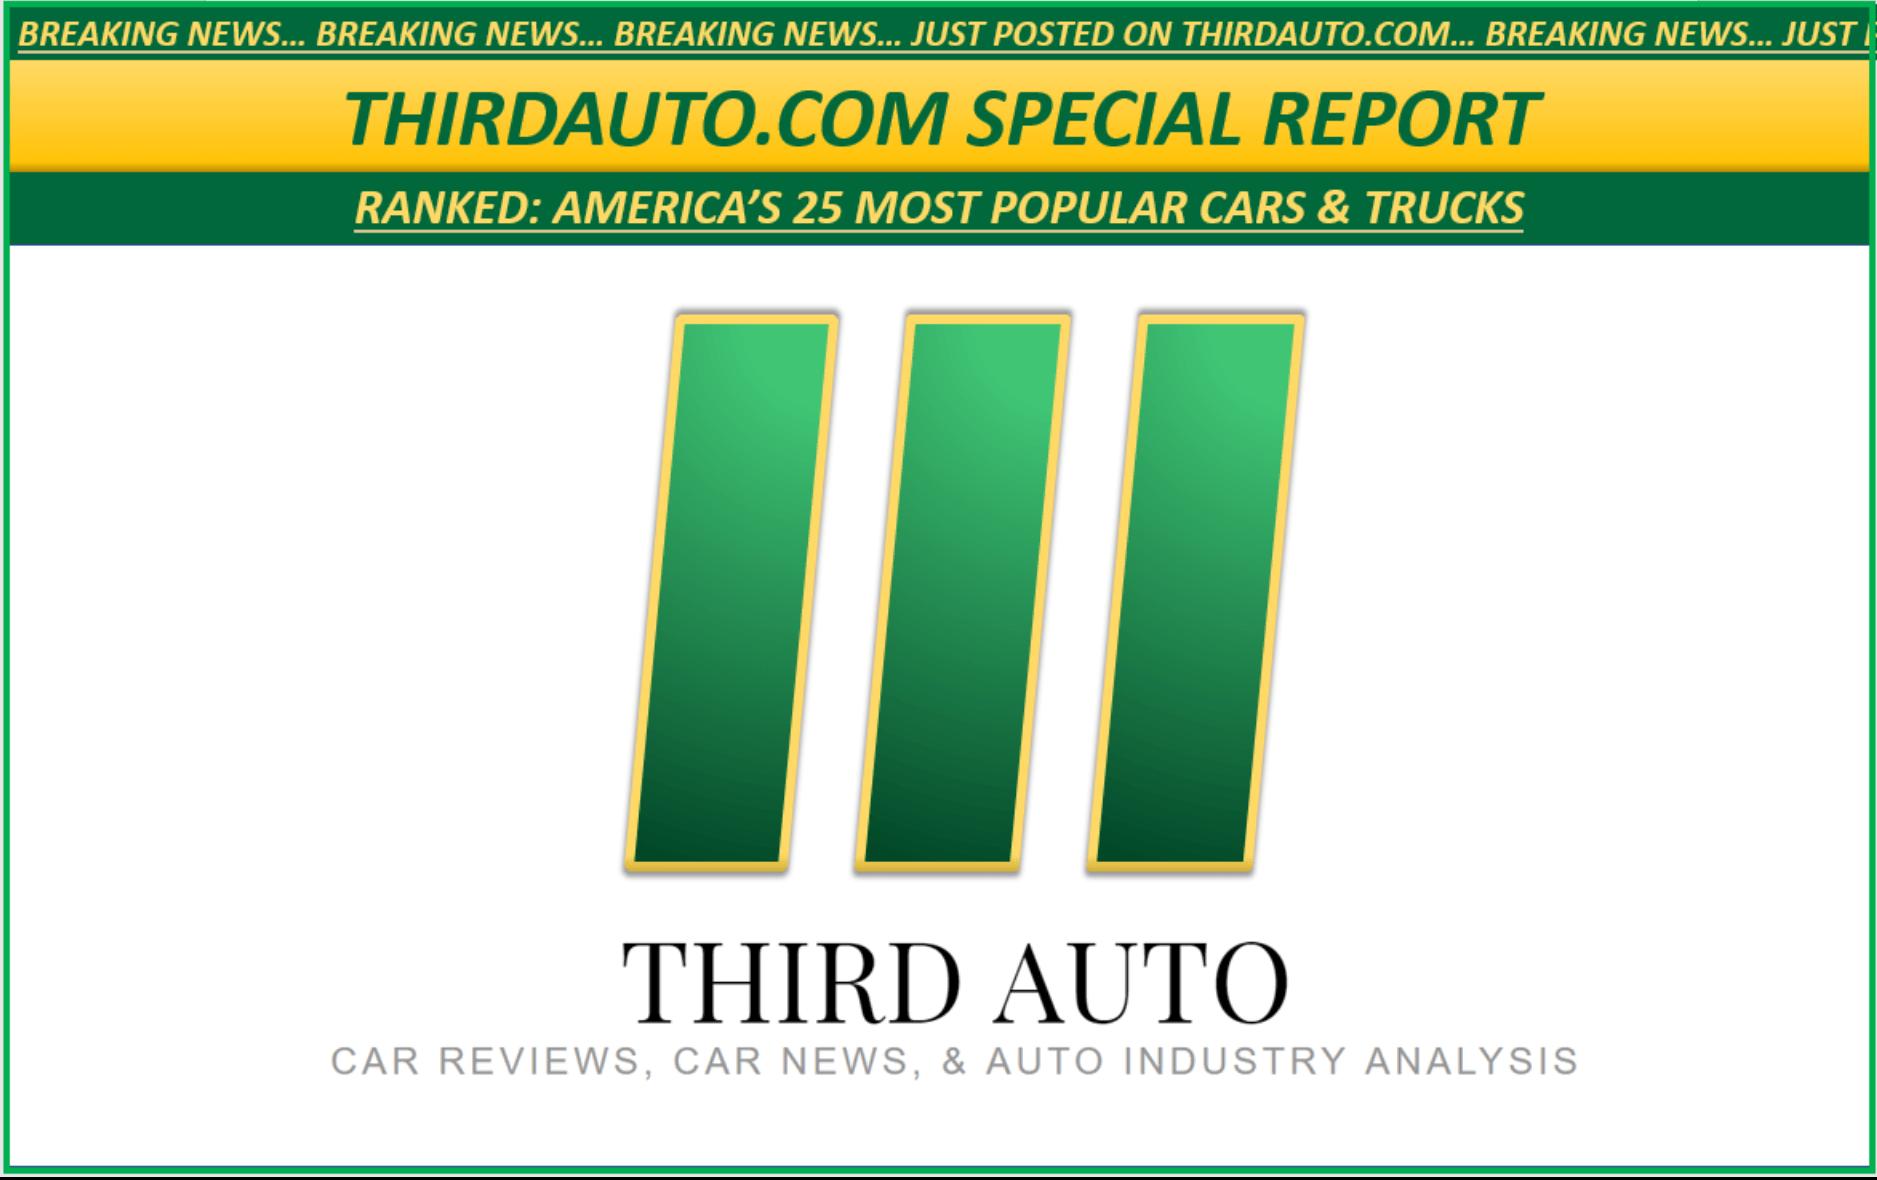 Ranked: America's 25 Most Popular Cars & Trucks